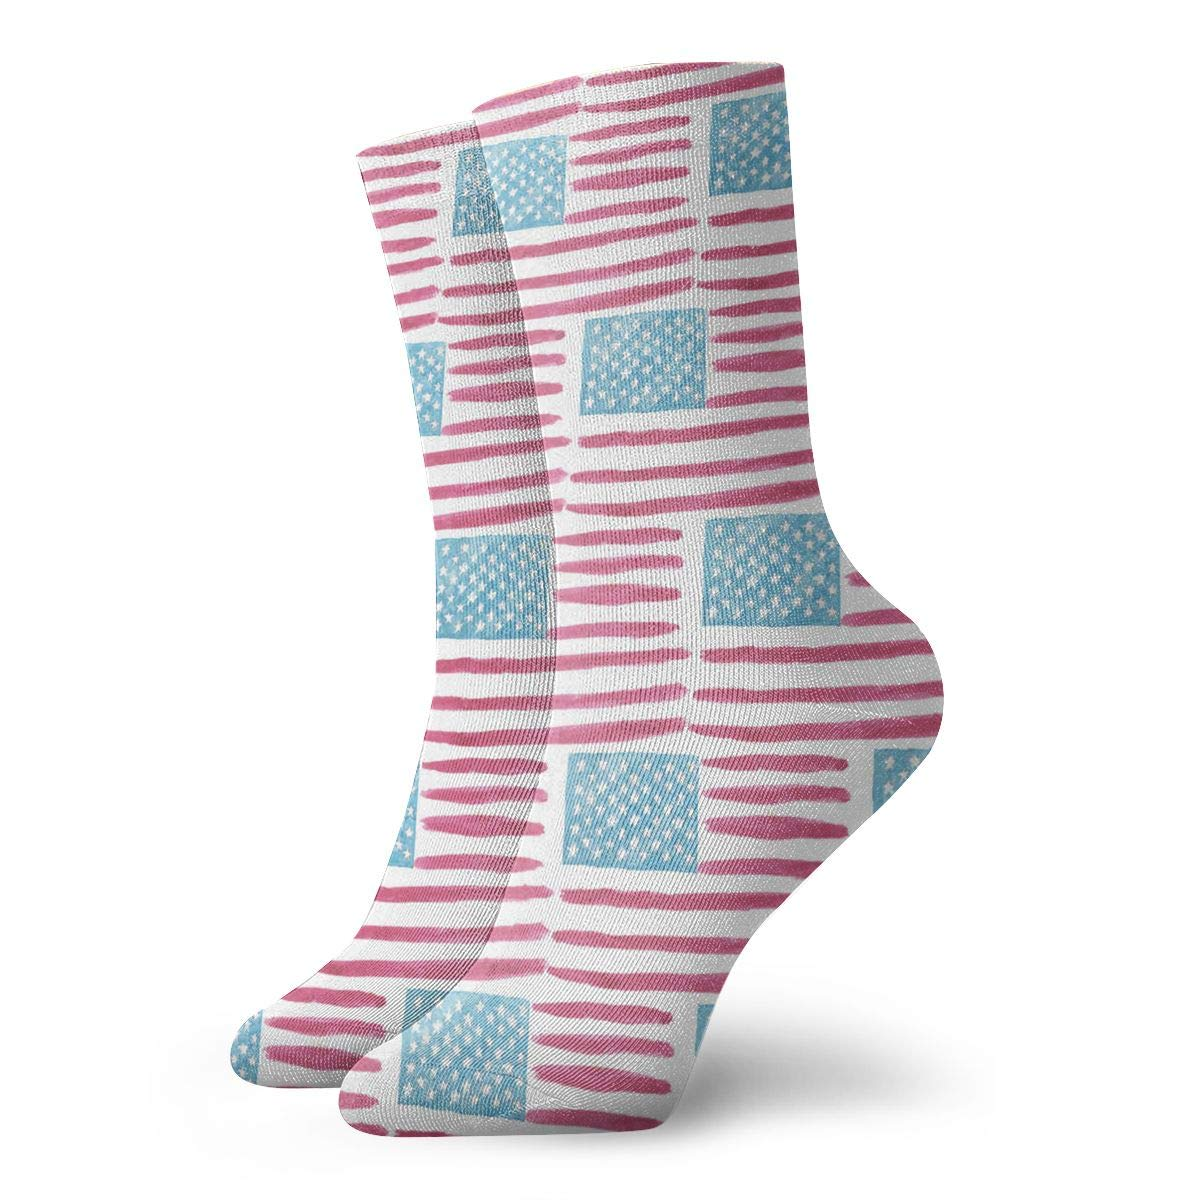 Art Red Blue Unisex Funny Casual Crew Socks Athletic Socks For Boys Girls Kids Teenagers